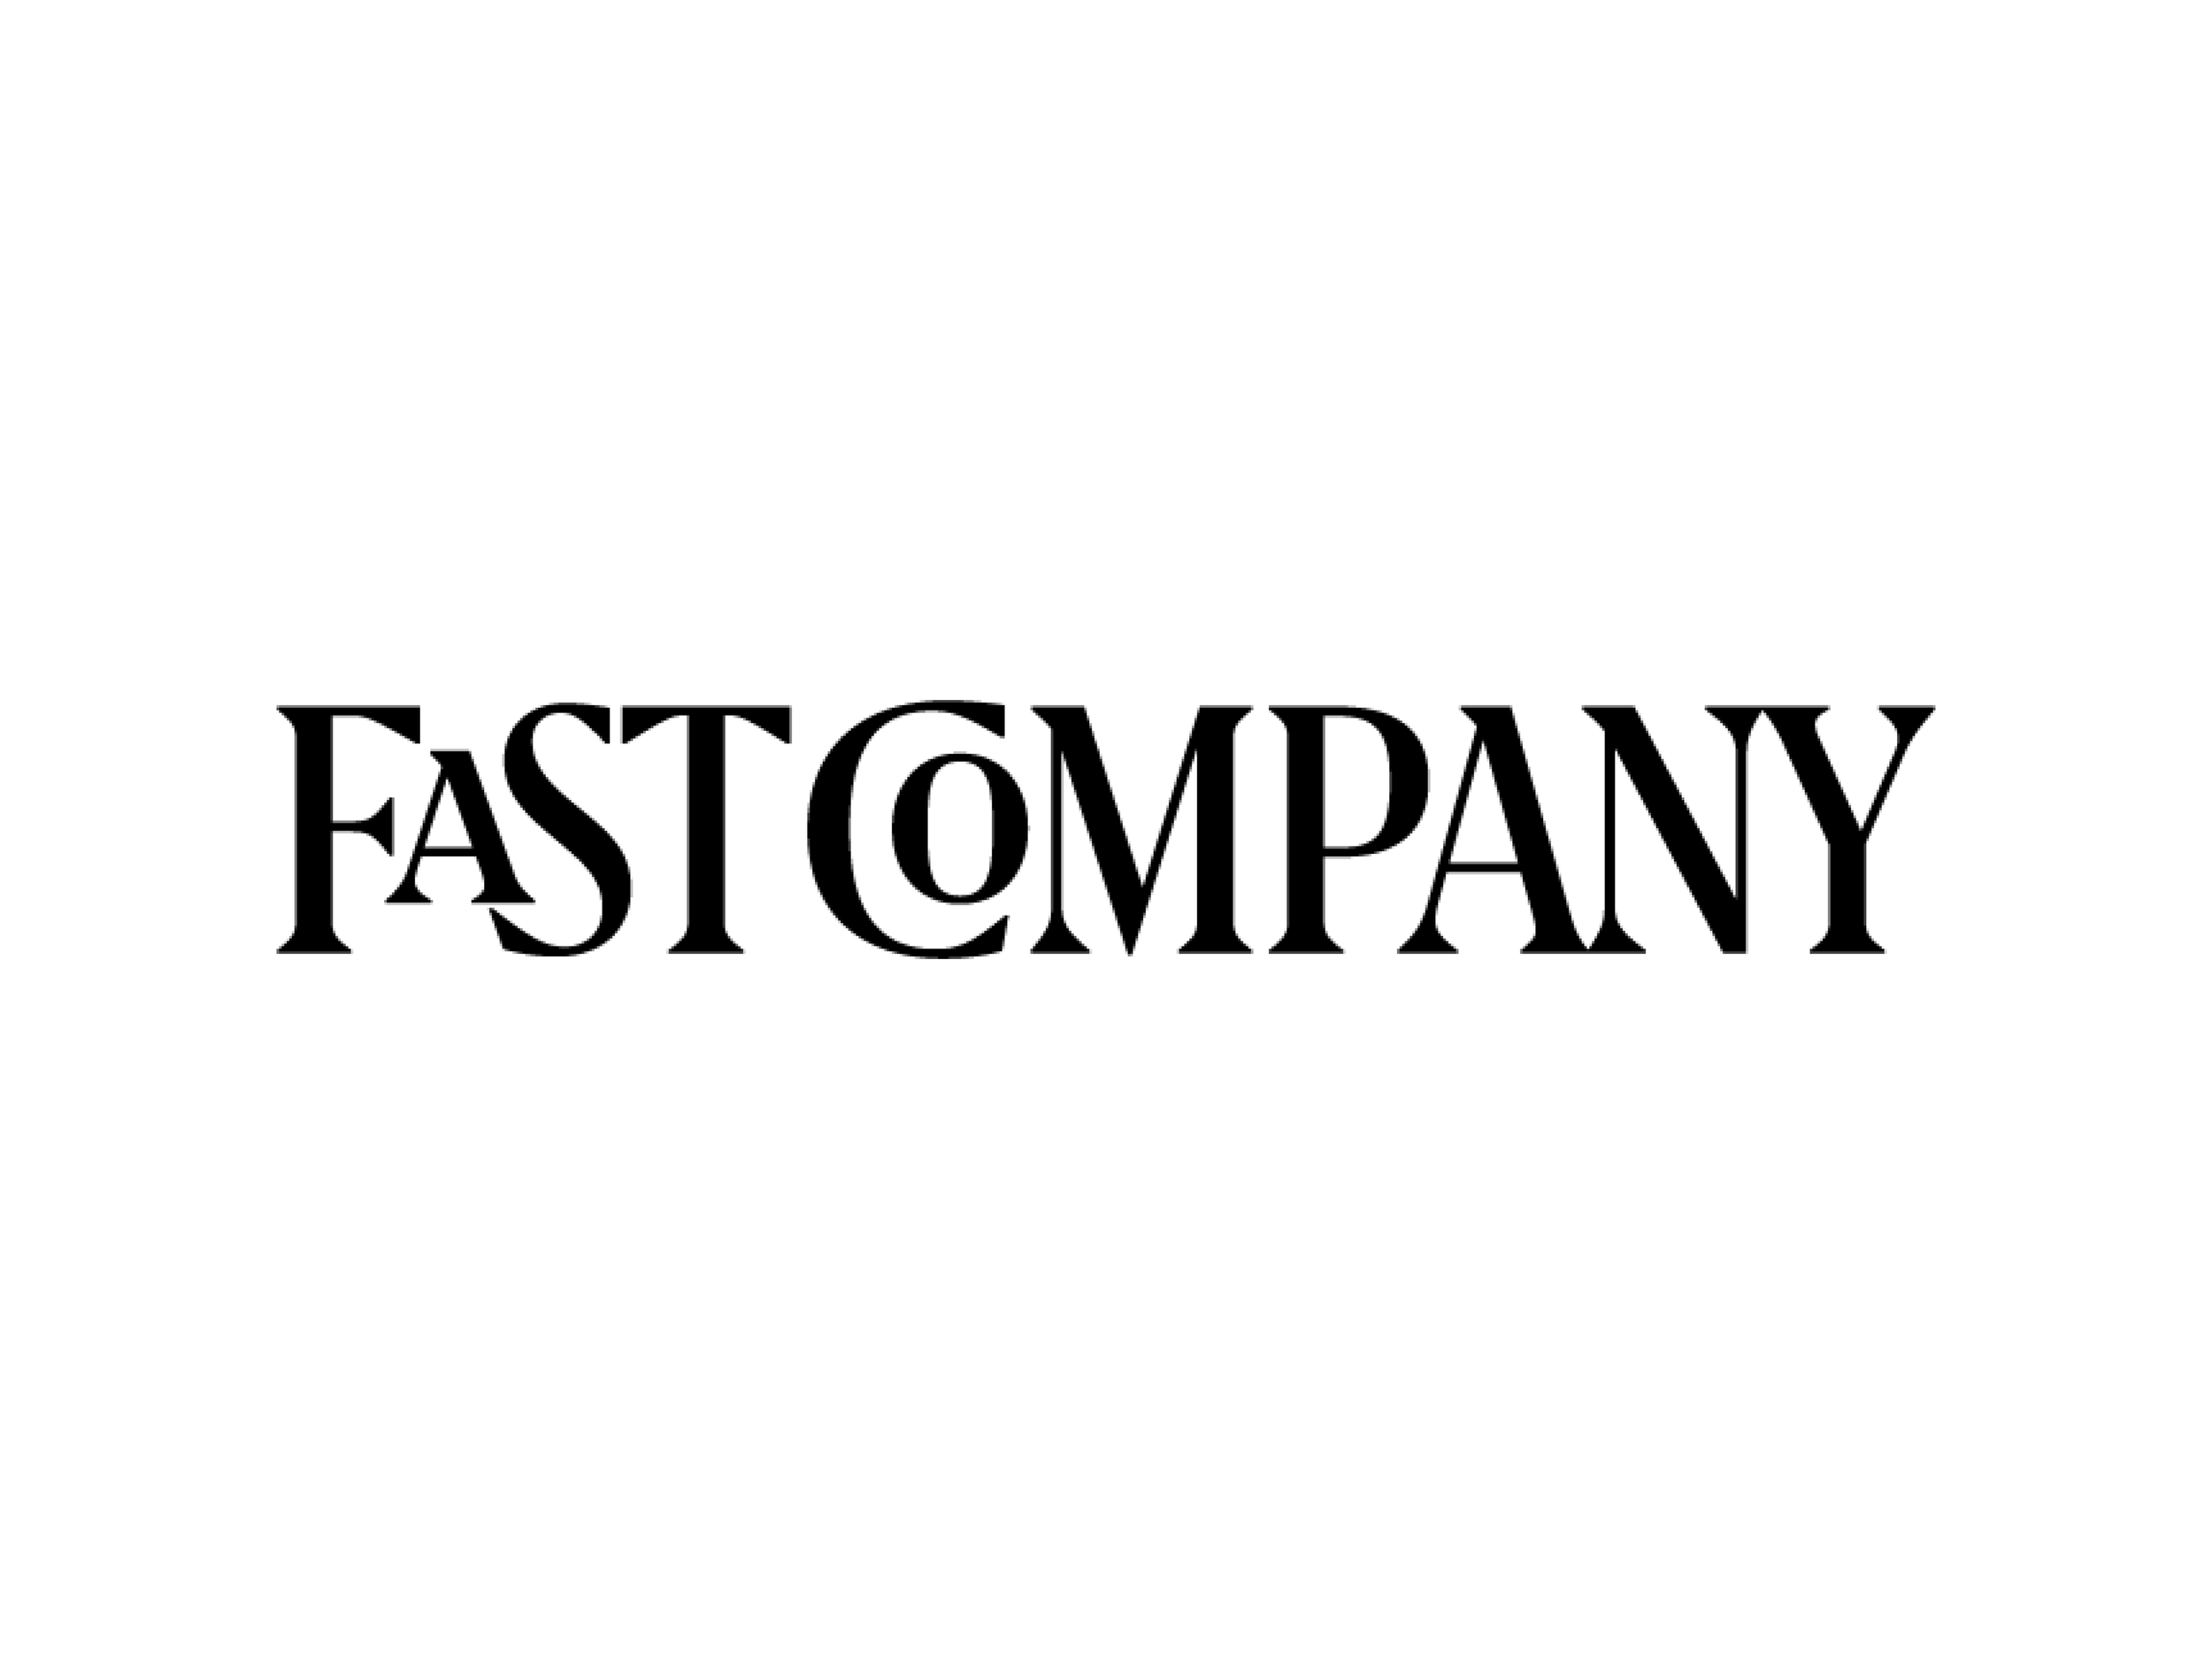 FASTCOMP.png